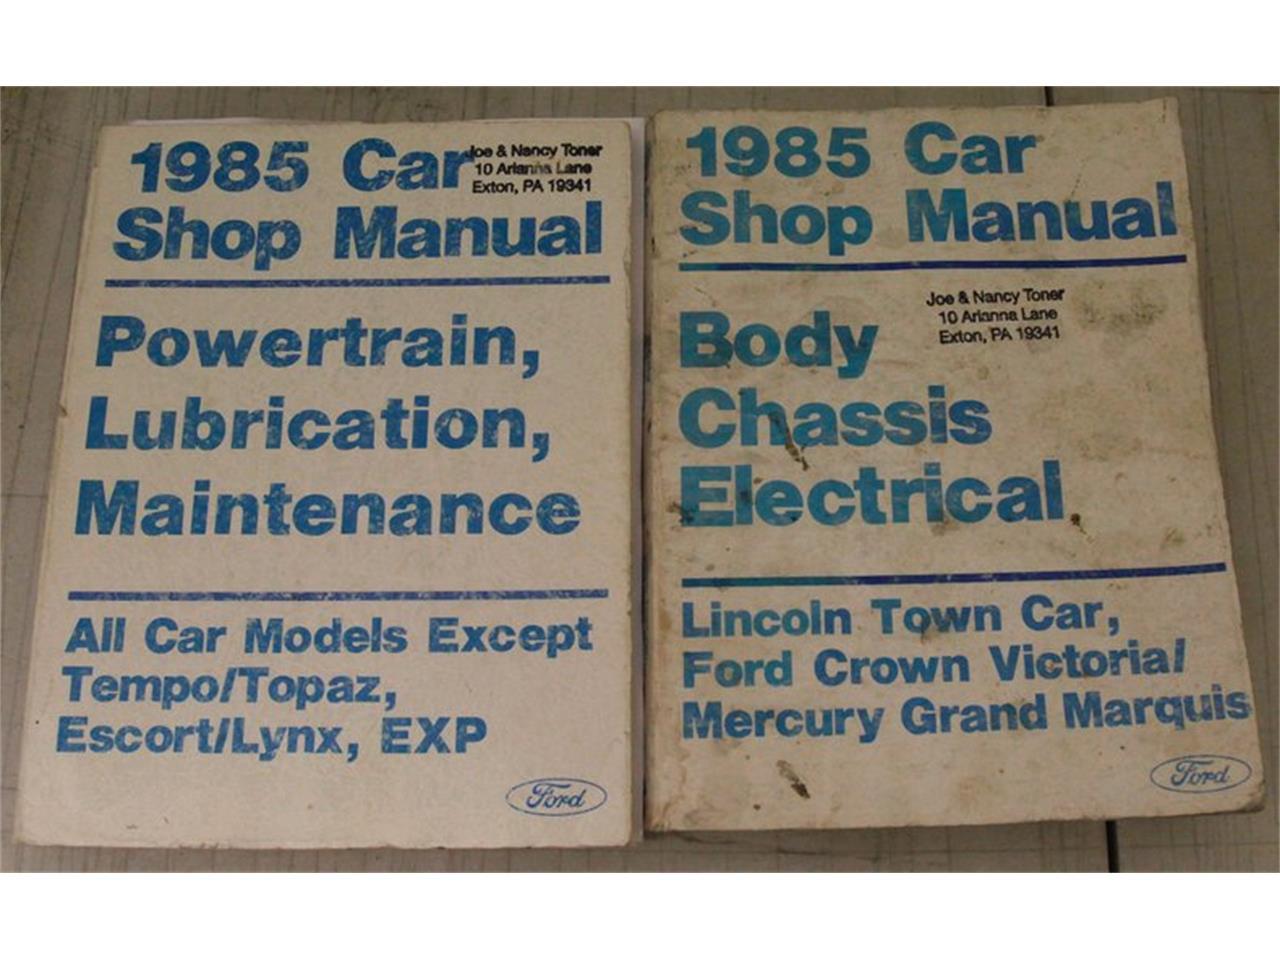 1985 Lincoln Town Car (CC-1373763) for sale in Morgantown, Pennsylvania